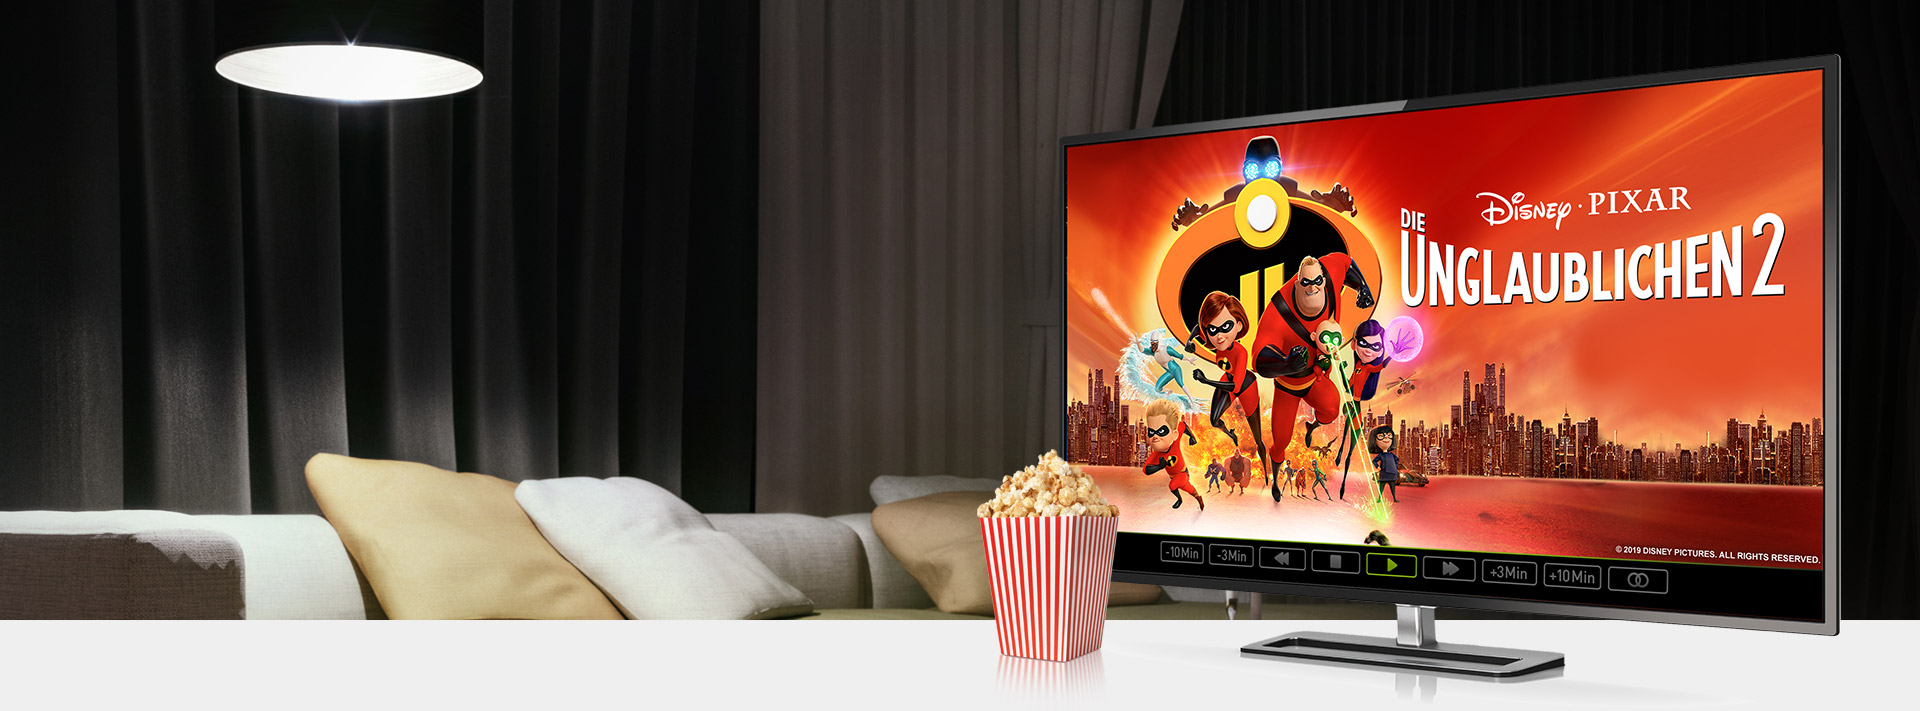 A1 Tv Digitales Fernsehen Inklusive 6 Monate Sky Gratis A1net